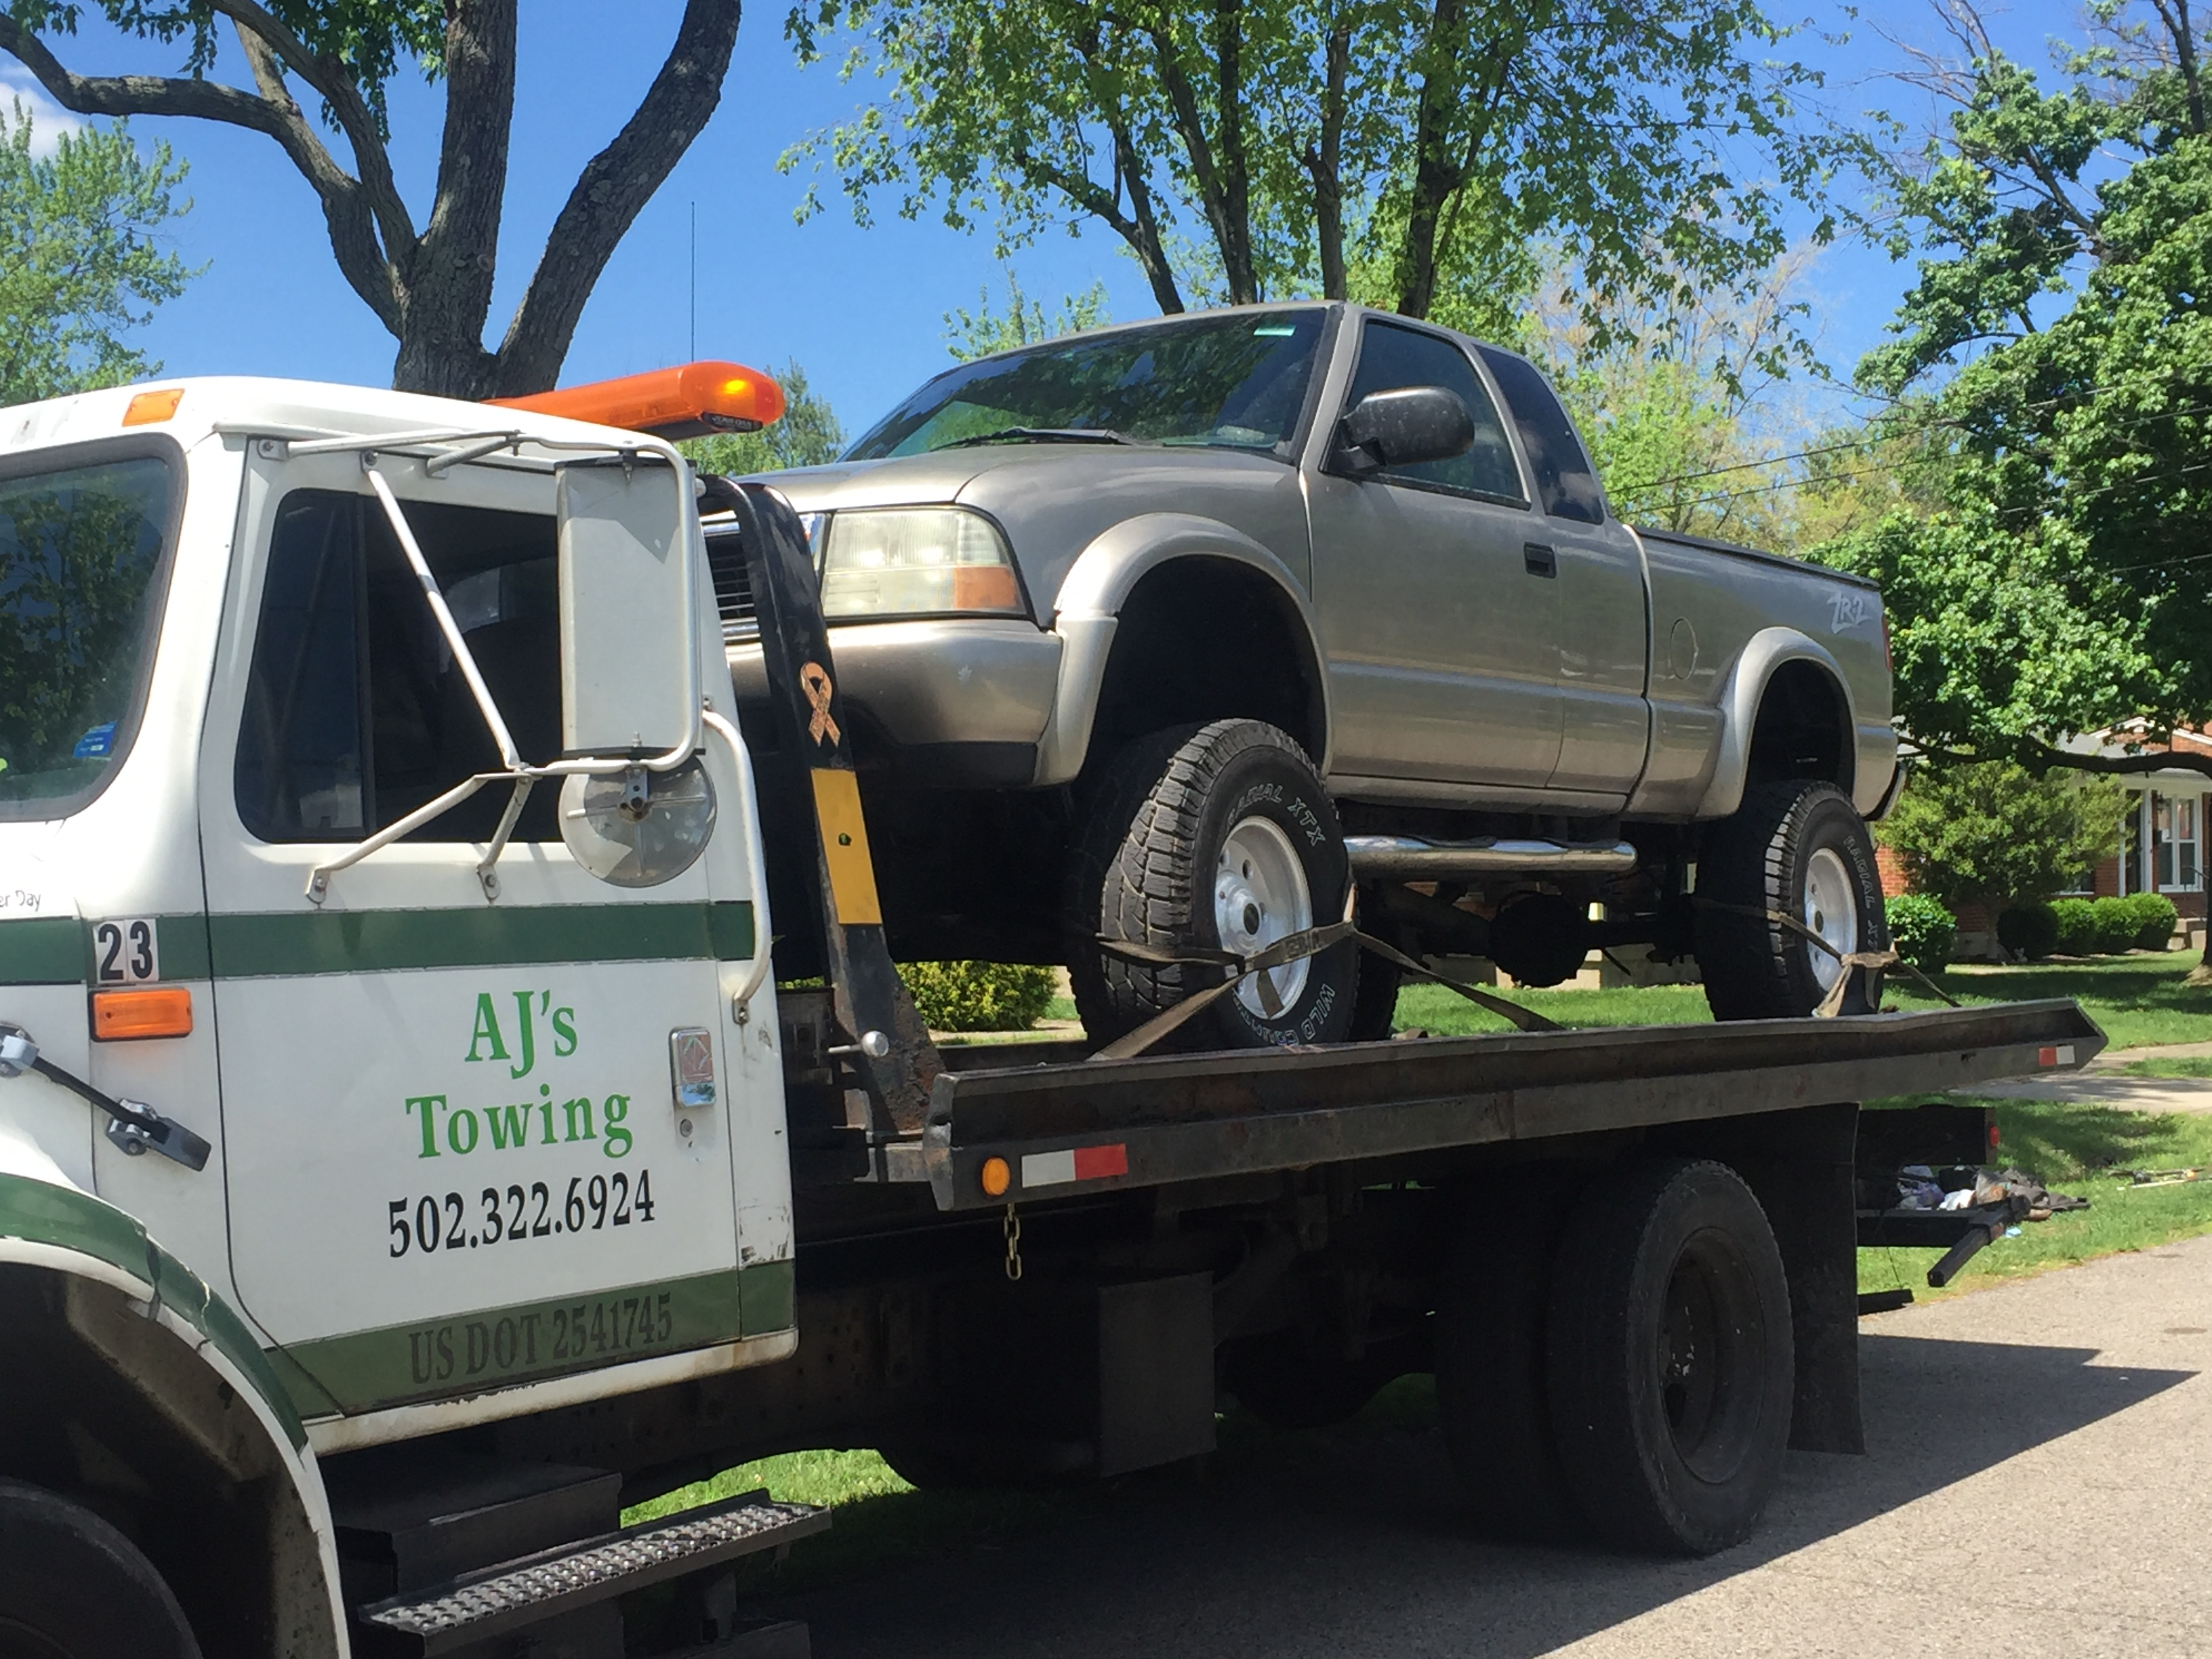 AJ's Towing Service image 19